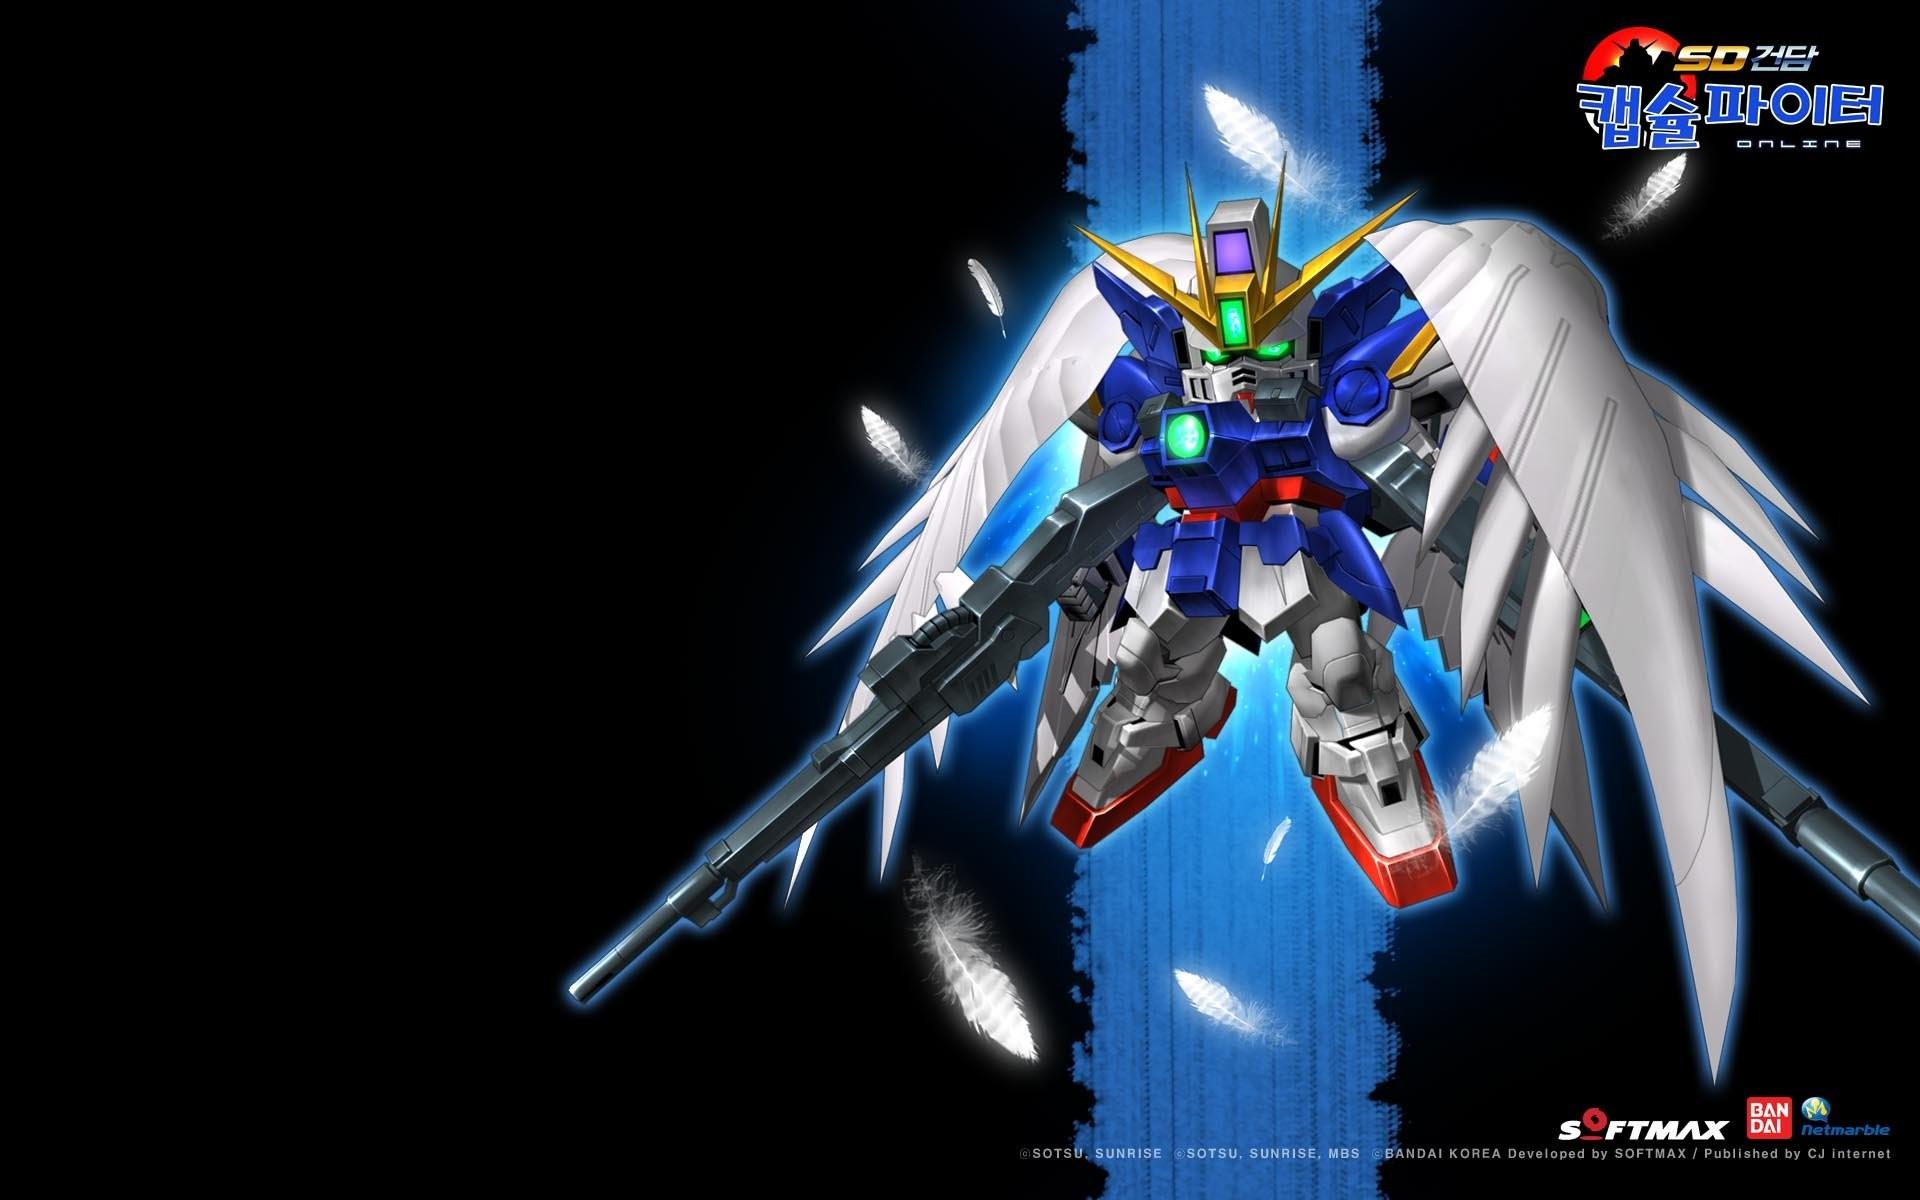 X Wing Fighter Iphone Wallpaper Gundam Wing Zero Wallpaper 56 Images